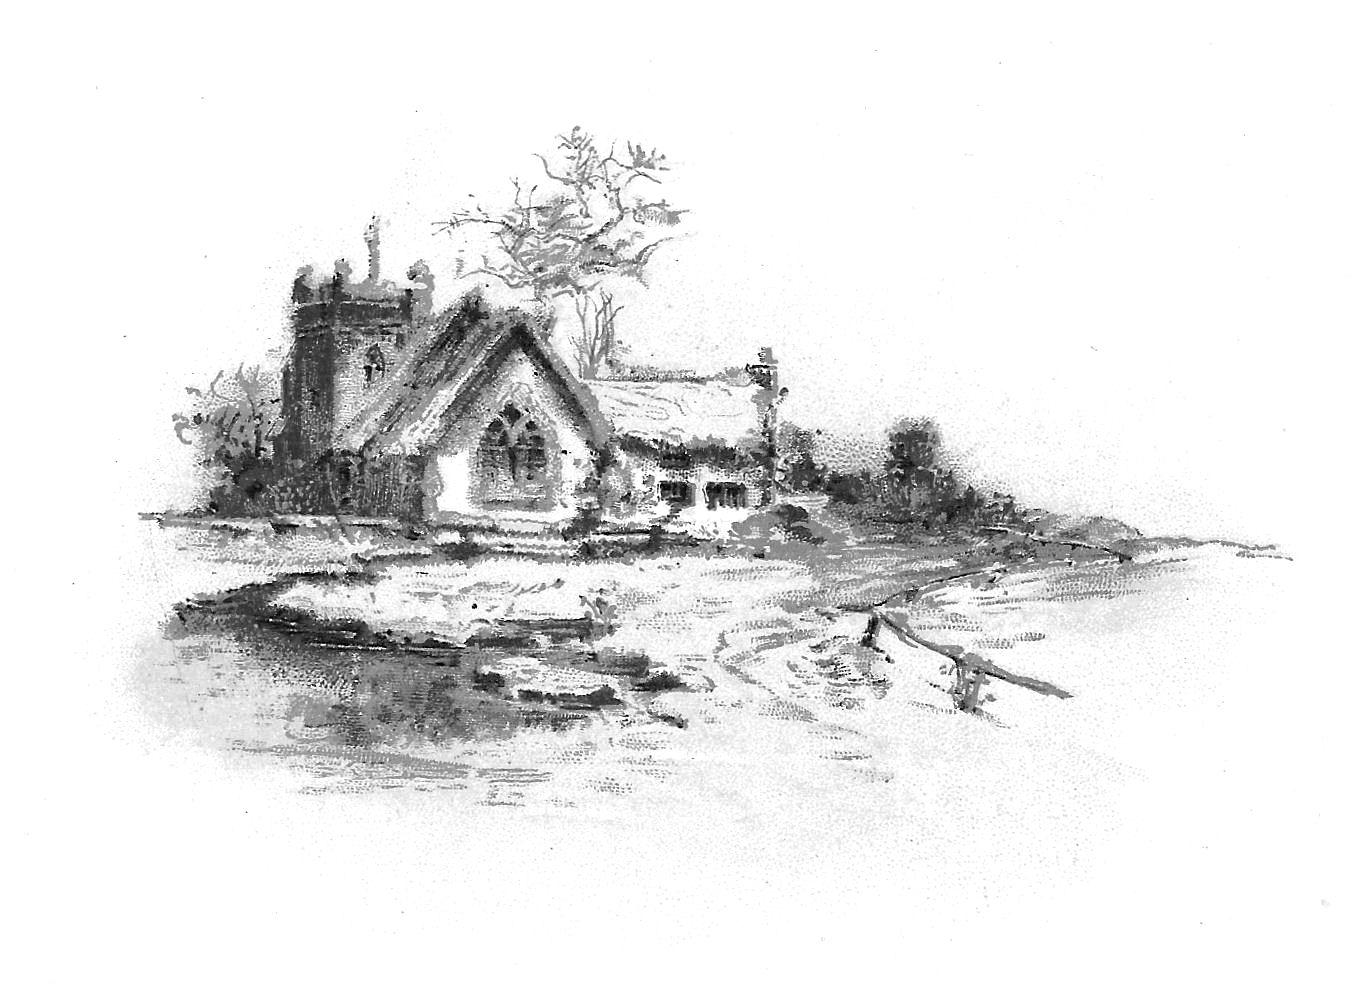 Antique Images: Free Church Clip Art: Rustic Church